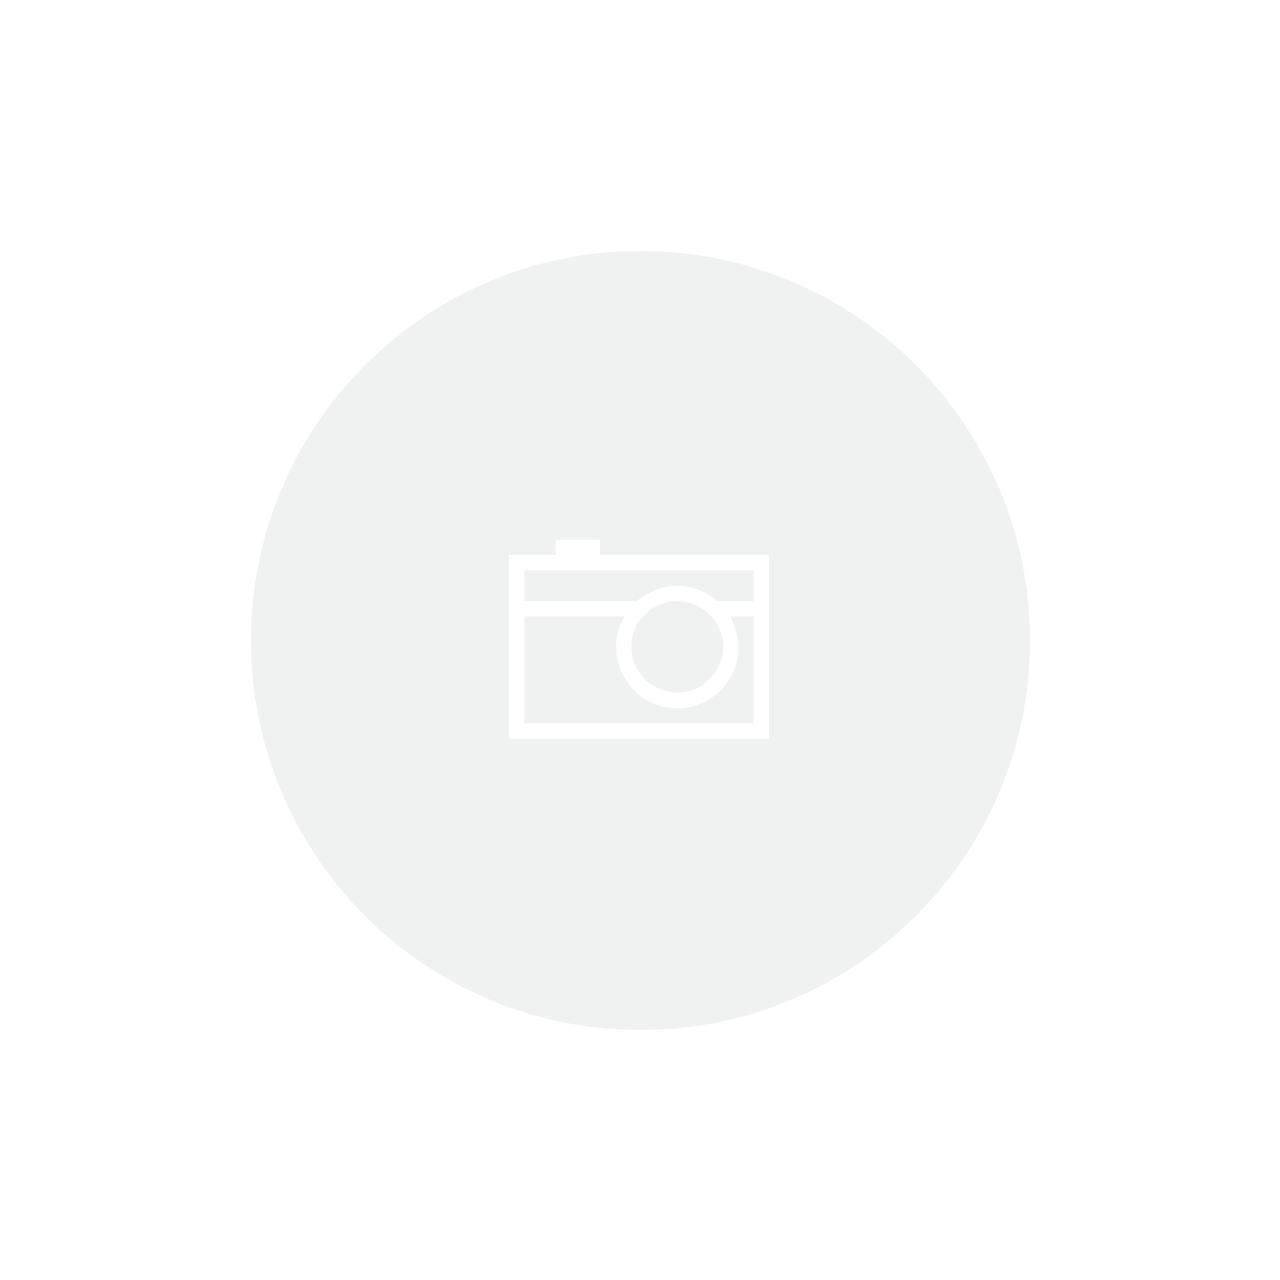 Cesta Retangular Arame Cromado 315x150x303mm Tramontina